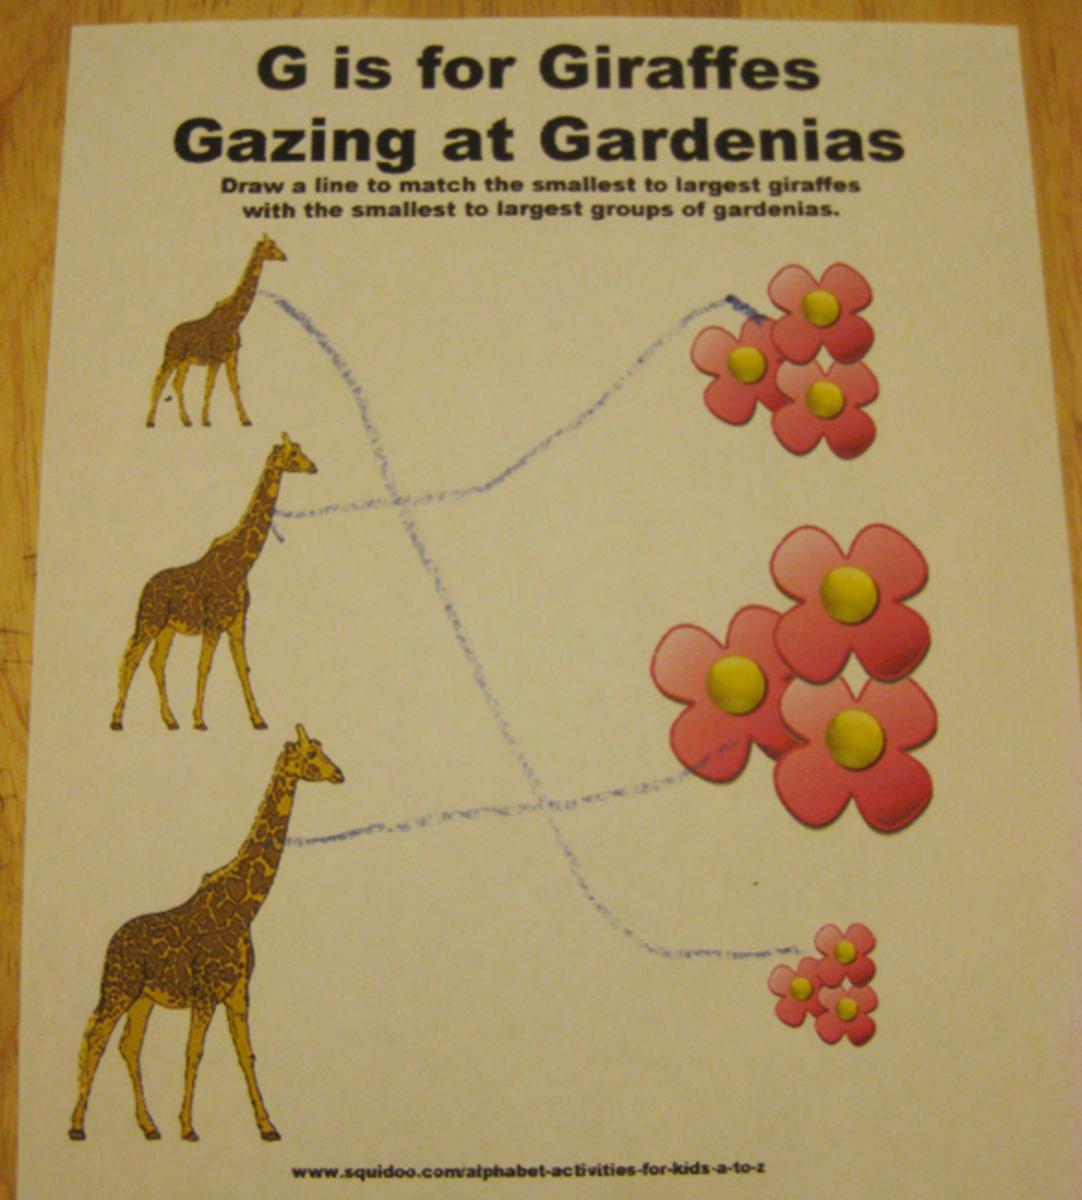 g is for giraffes gazing at gardenias alphabet activities for kids